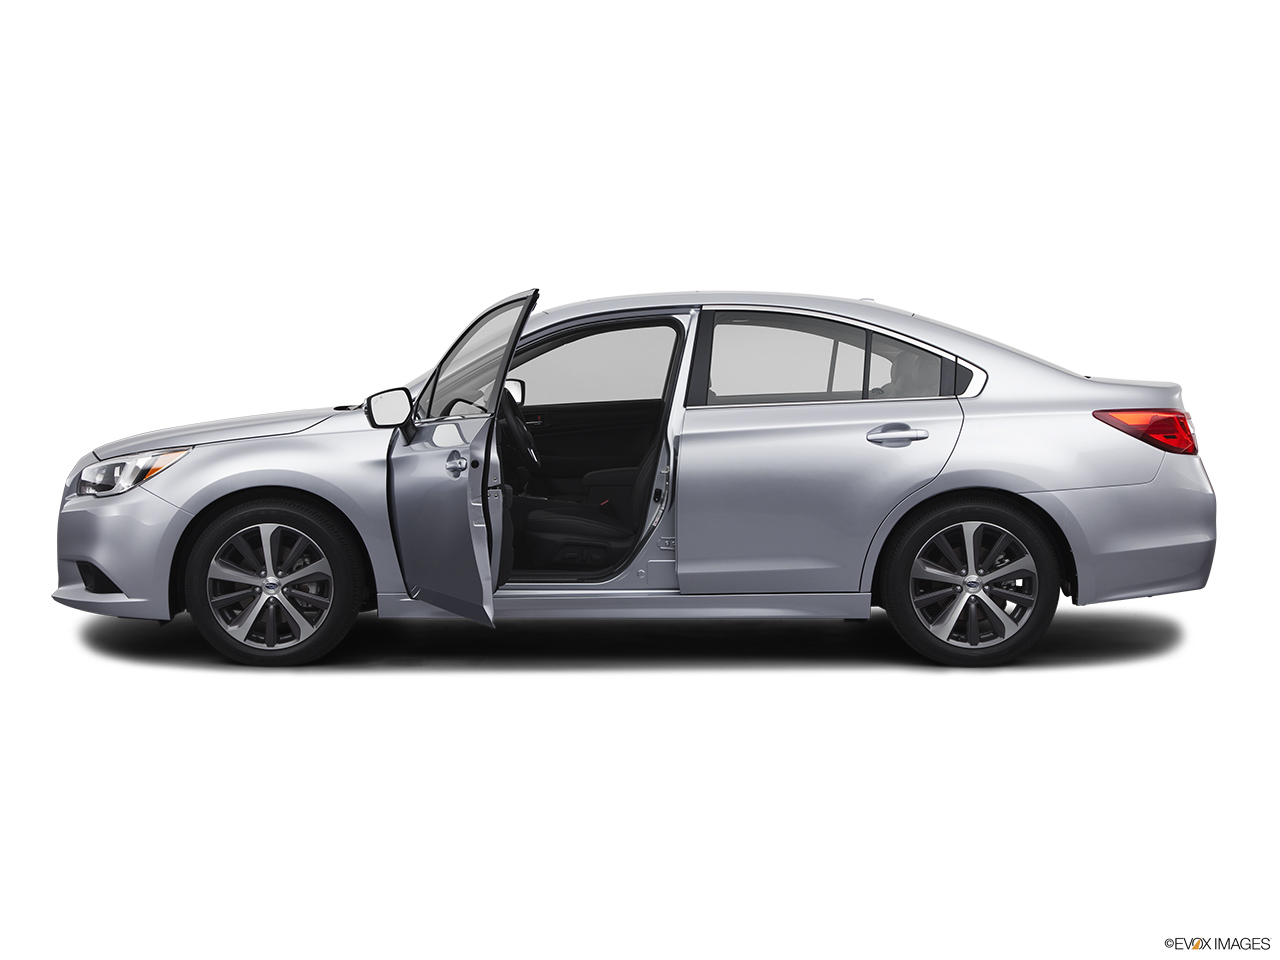 Subaru Legacy: Door open warning light